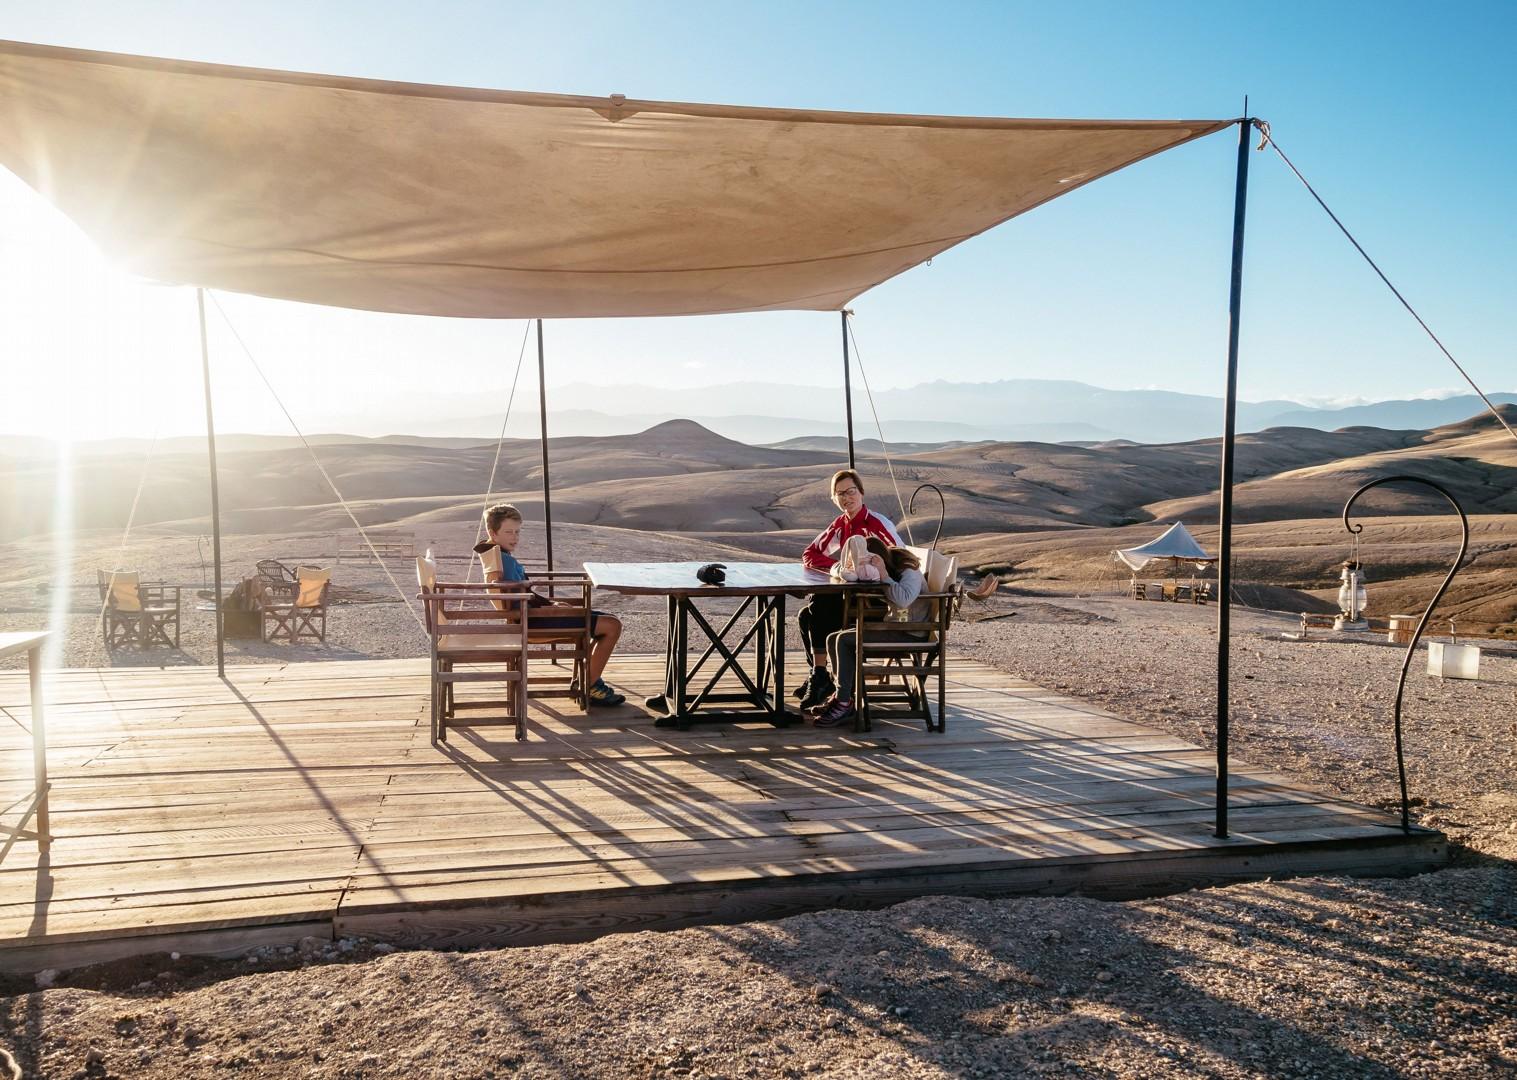 Family-Cycling-Holiday-Morocco-Desert-Mountains-Coast-Sahara-desert - Morocco - Desert, Mountains and Coast - Family Cycling